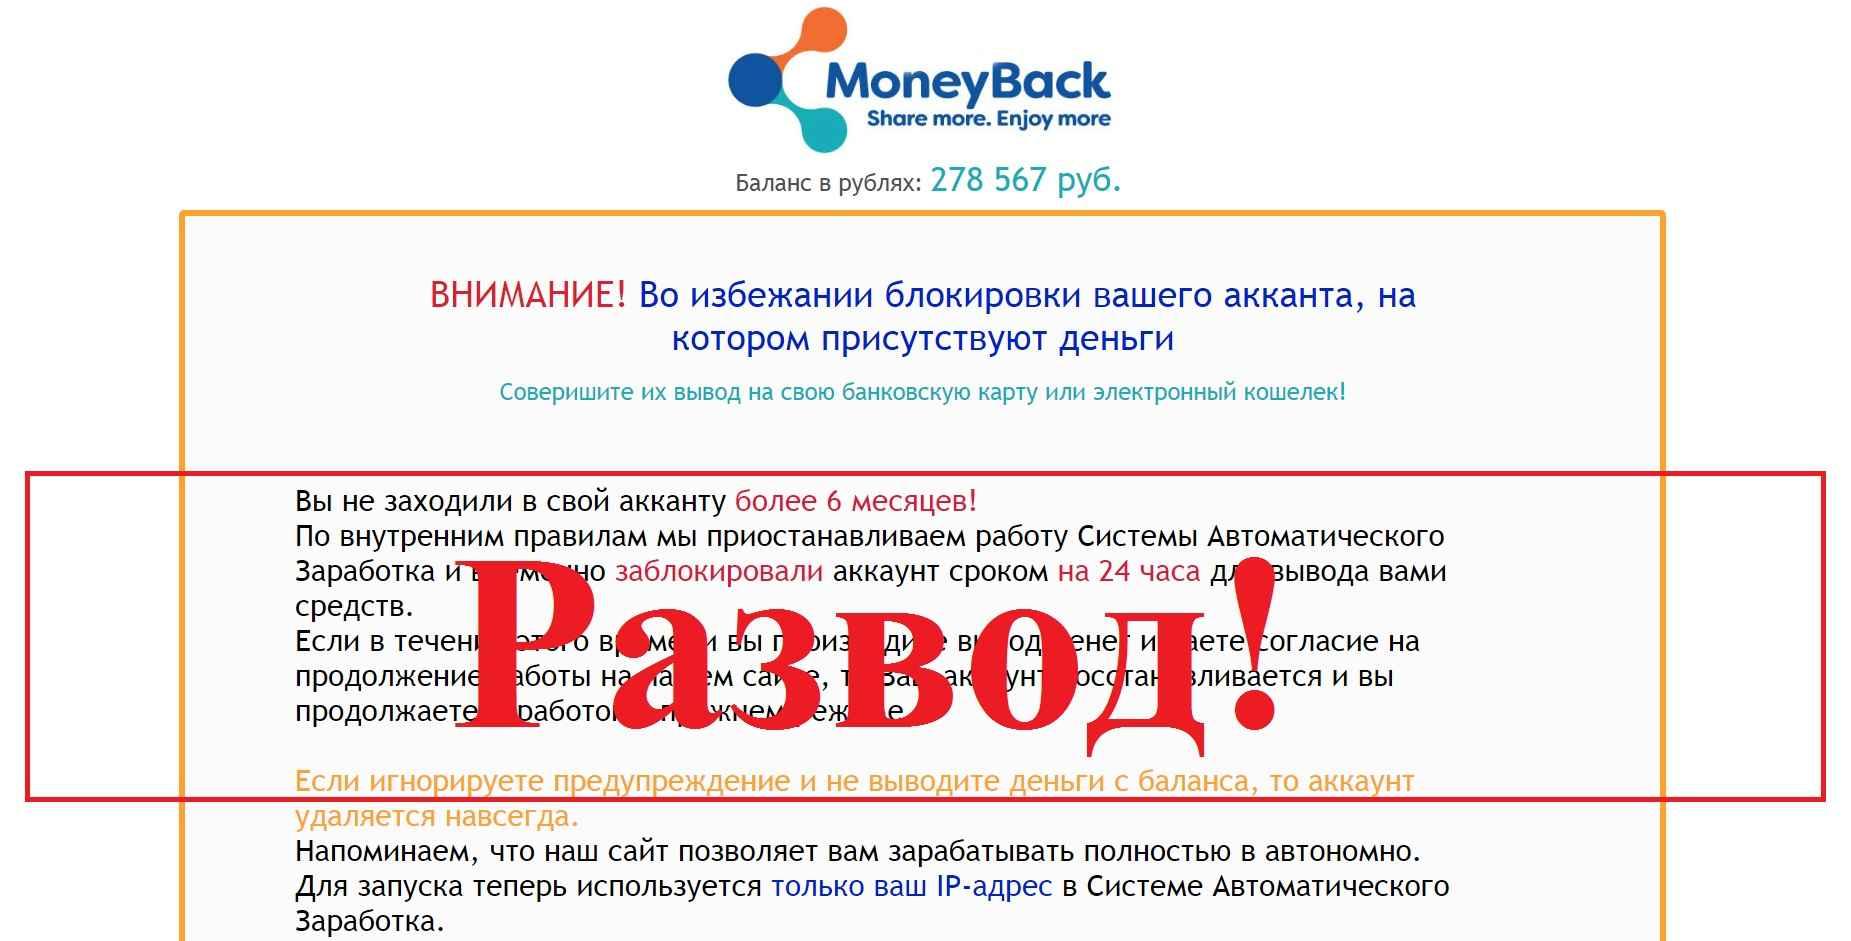 MoneyBack – отзывы о разводе